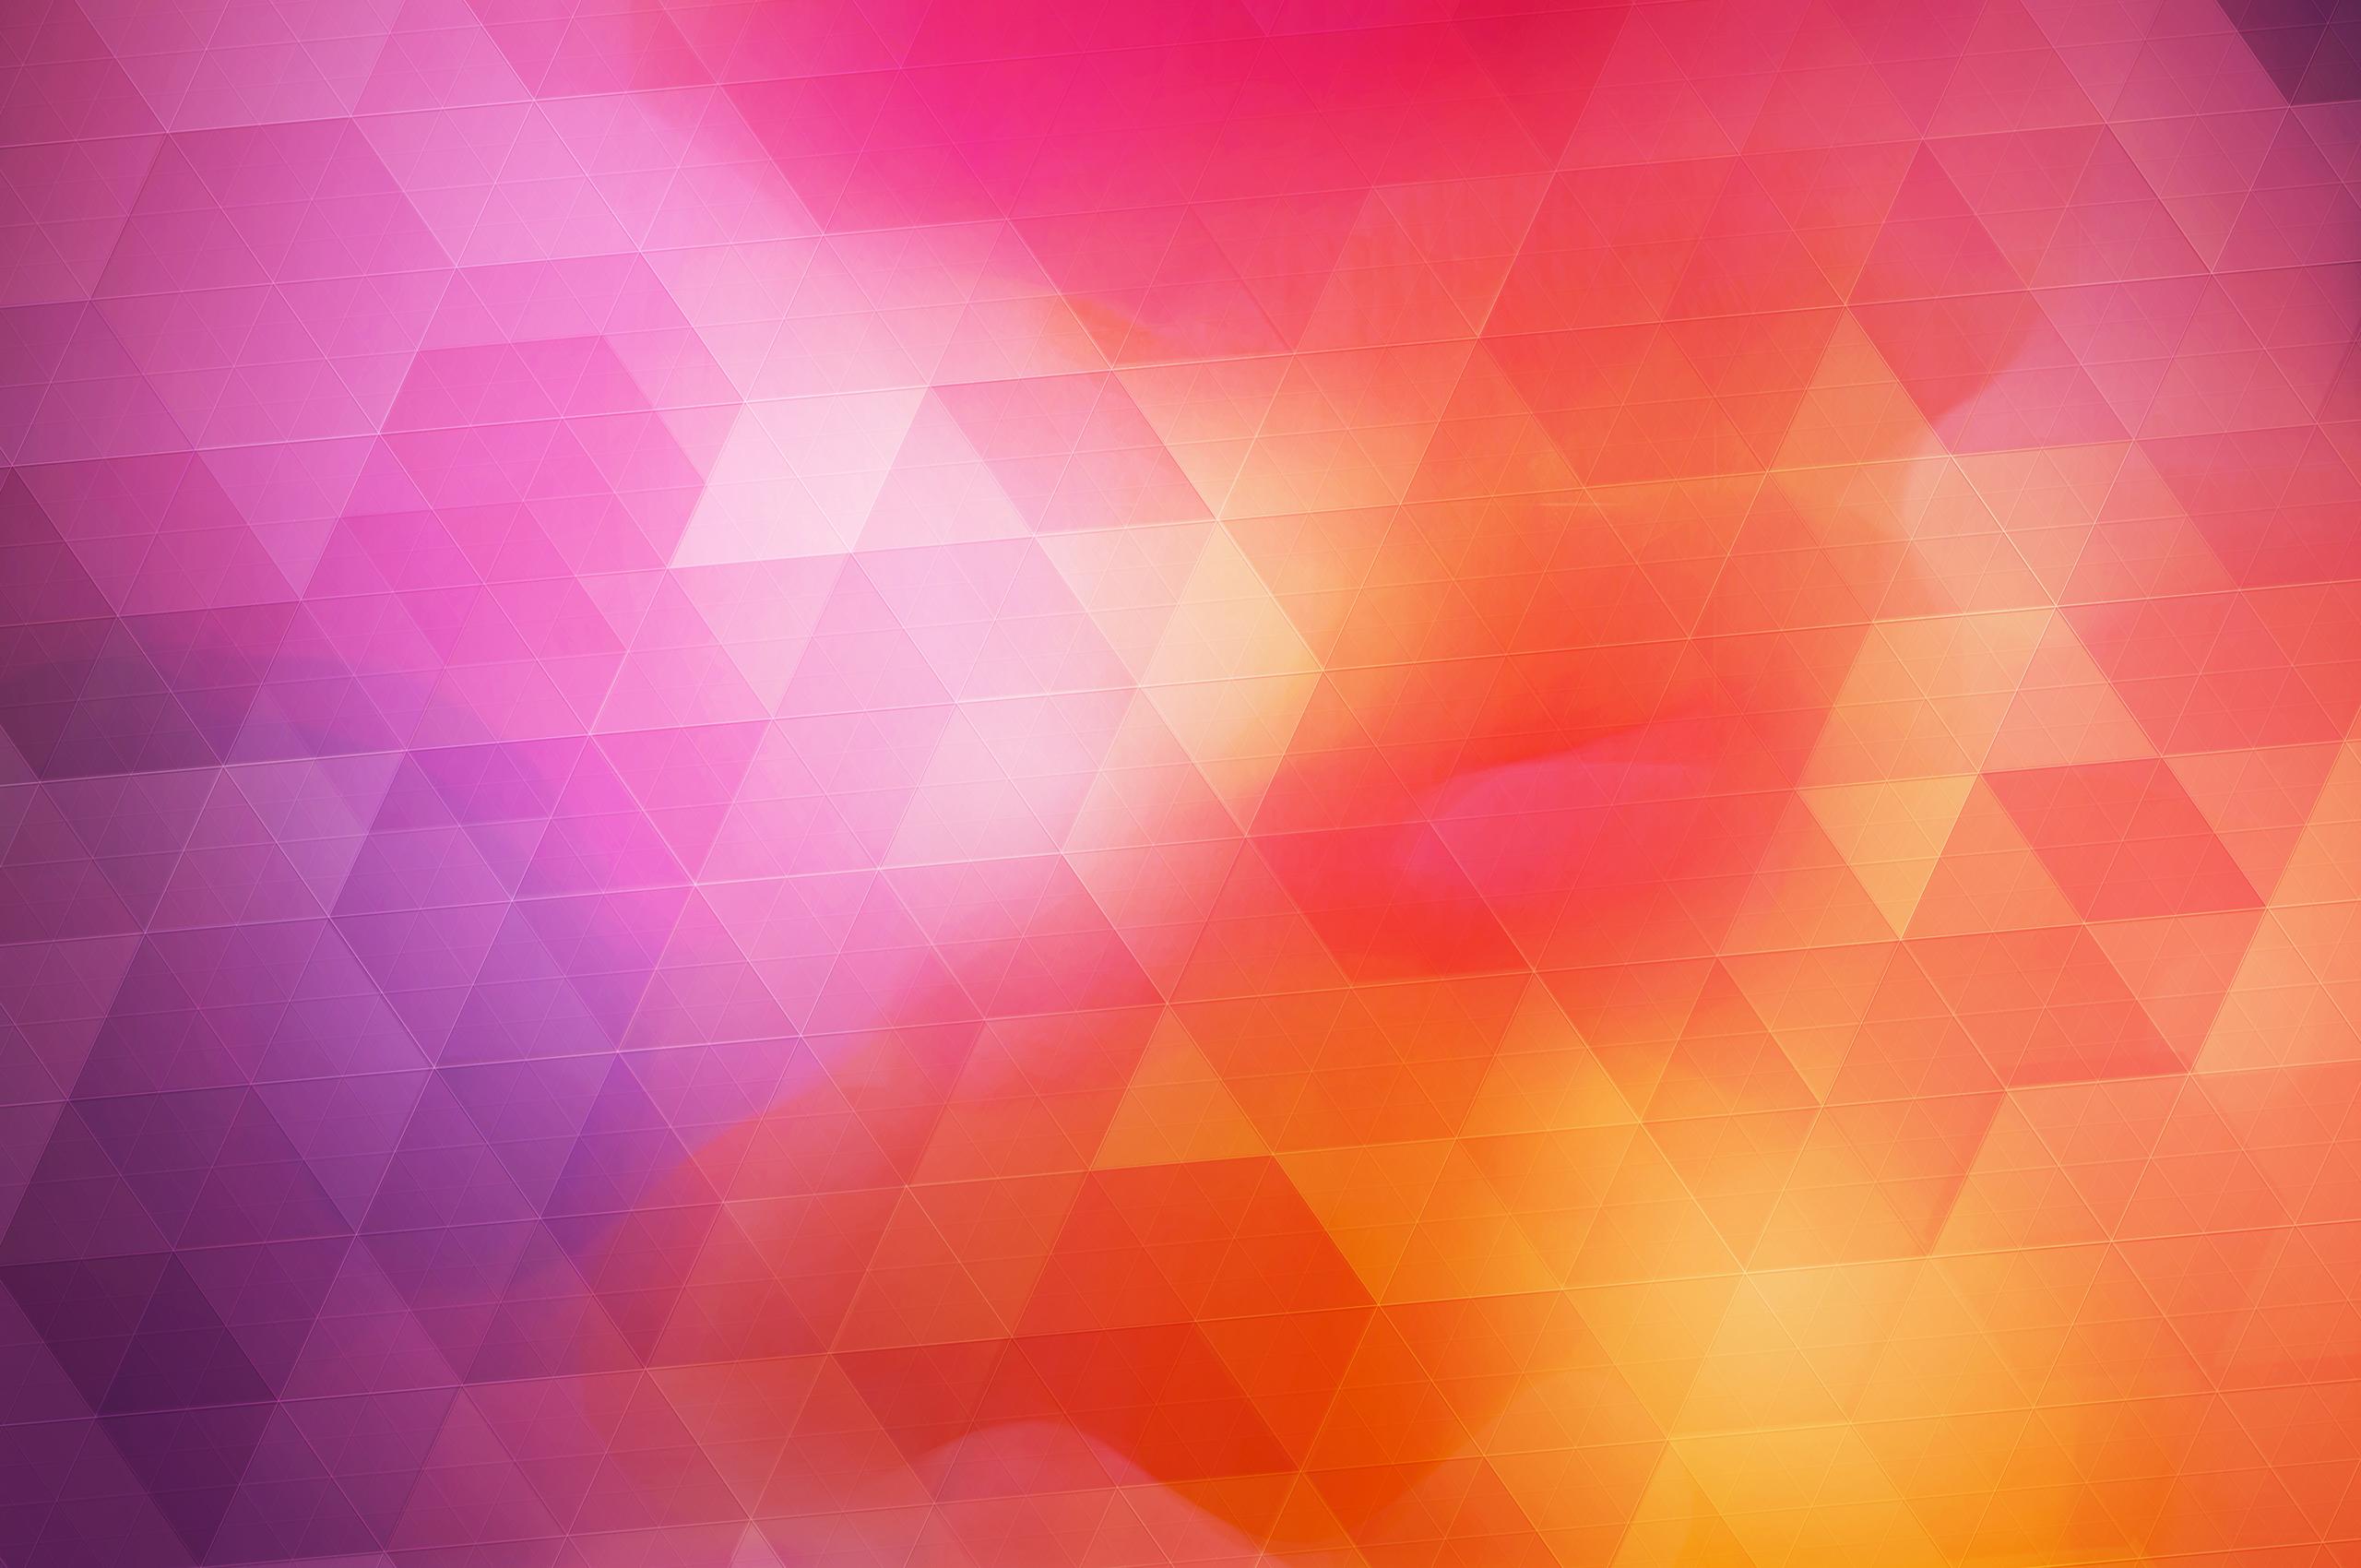 wallpaper wallpaper picker 2560x1700